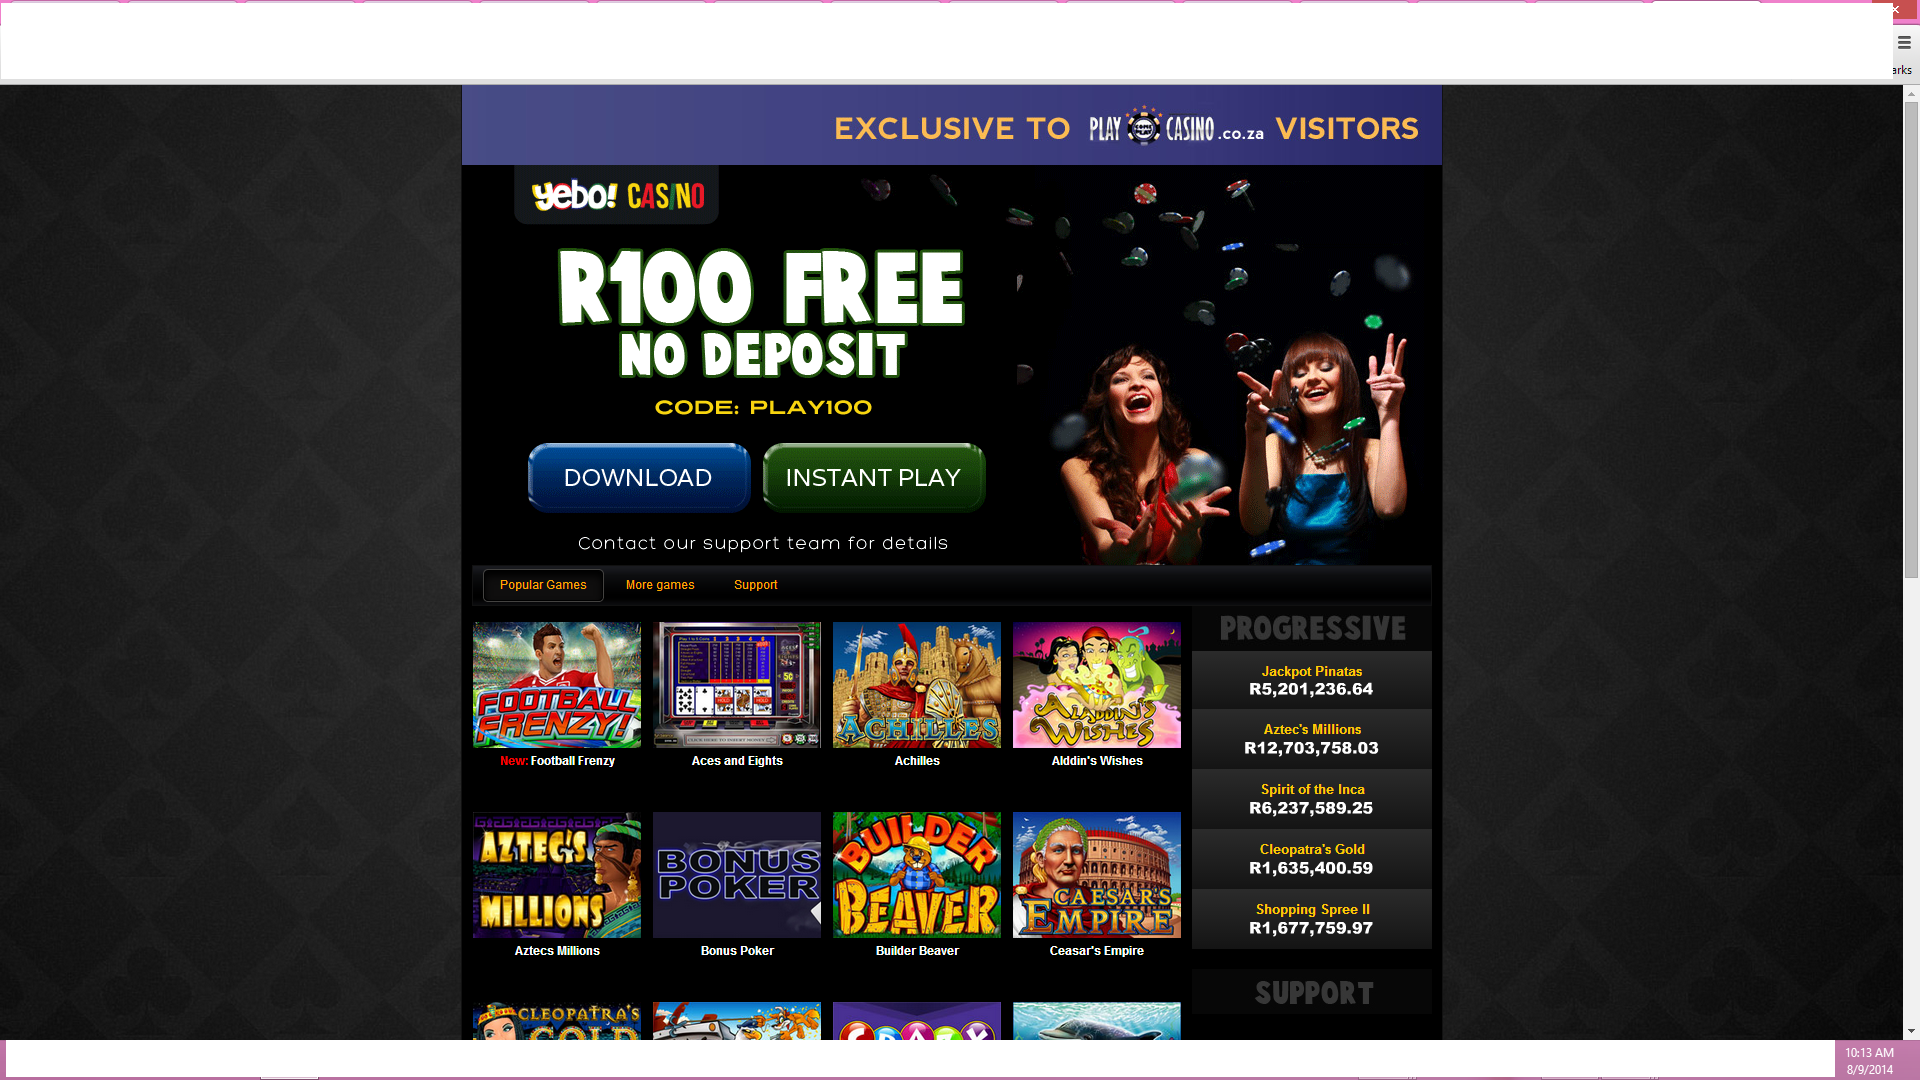 yebo casino no deposit codes 2019